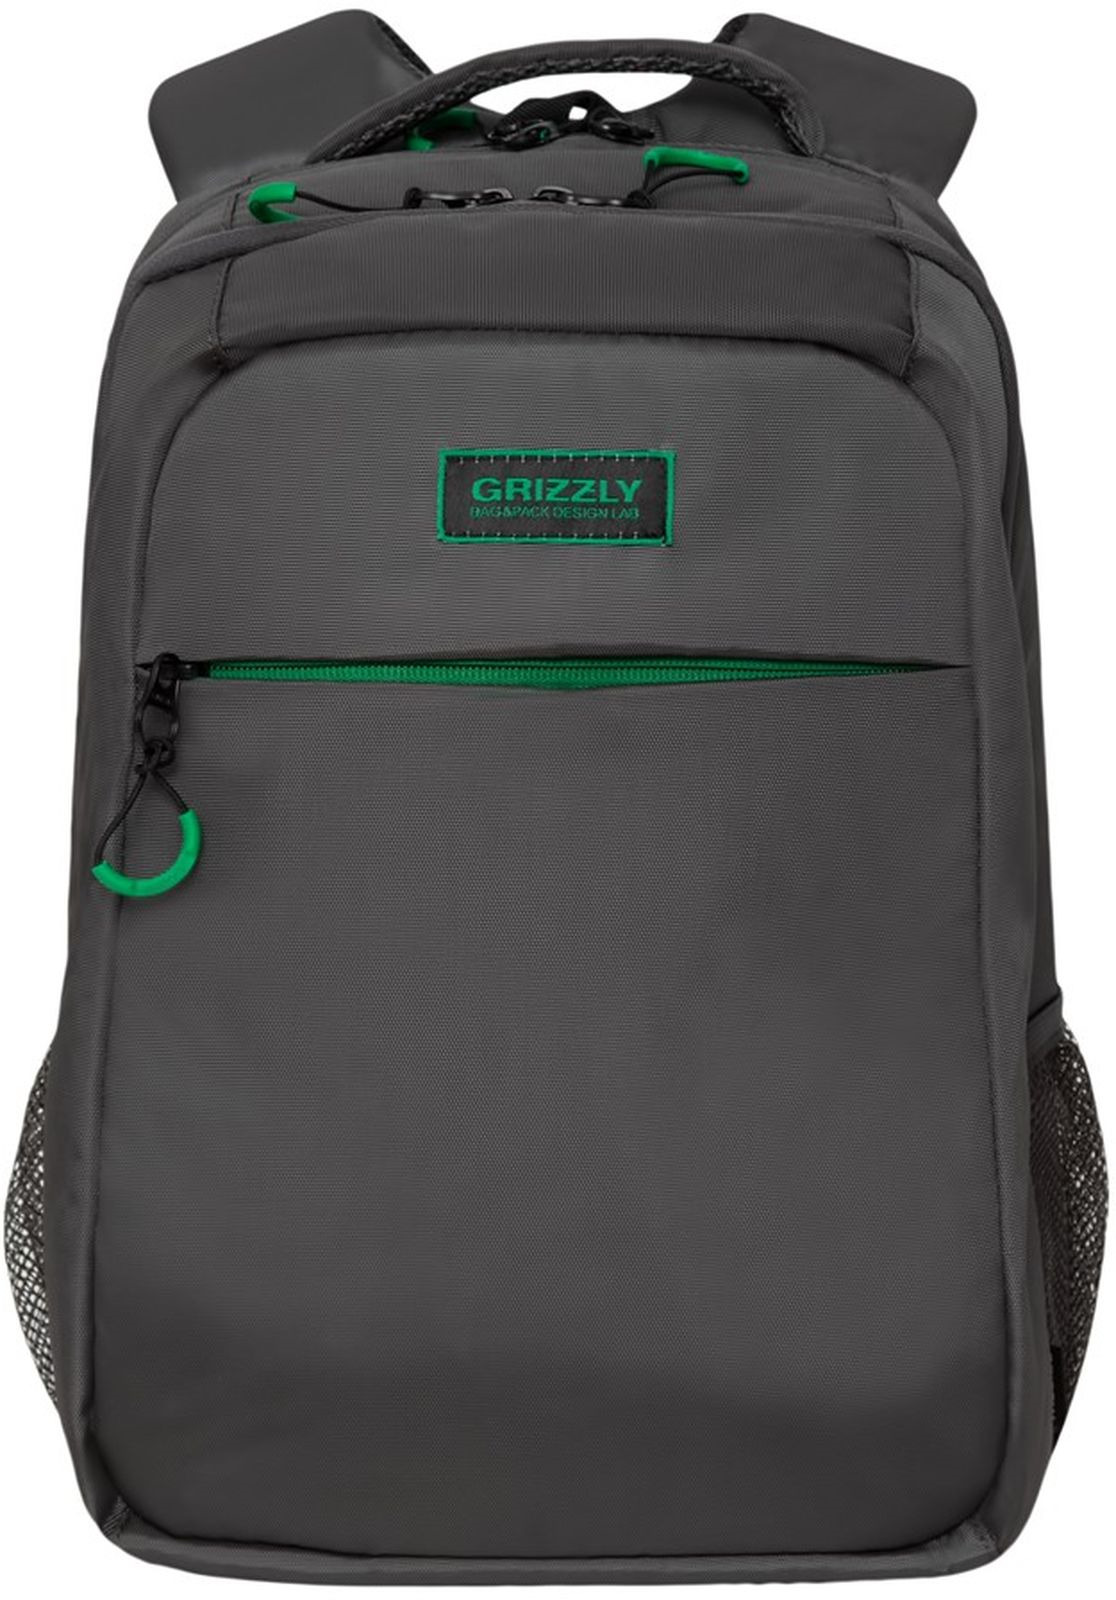 Рюкзак Grizzly, RU-933-2/1, темно-серый рюкзак молодежный grizzly 16 л ru 808 2 2